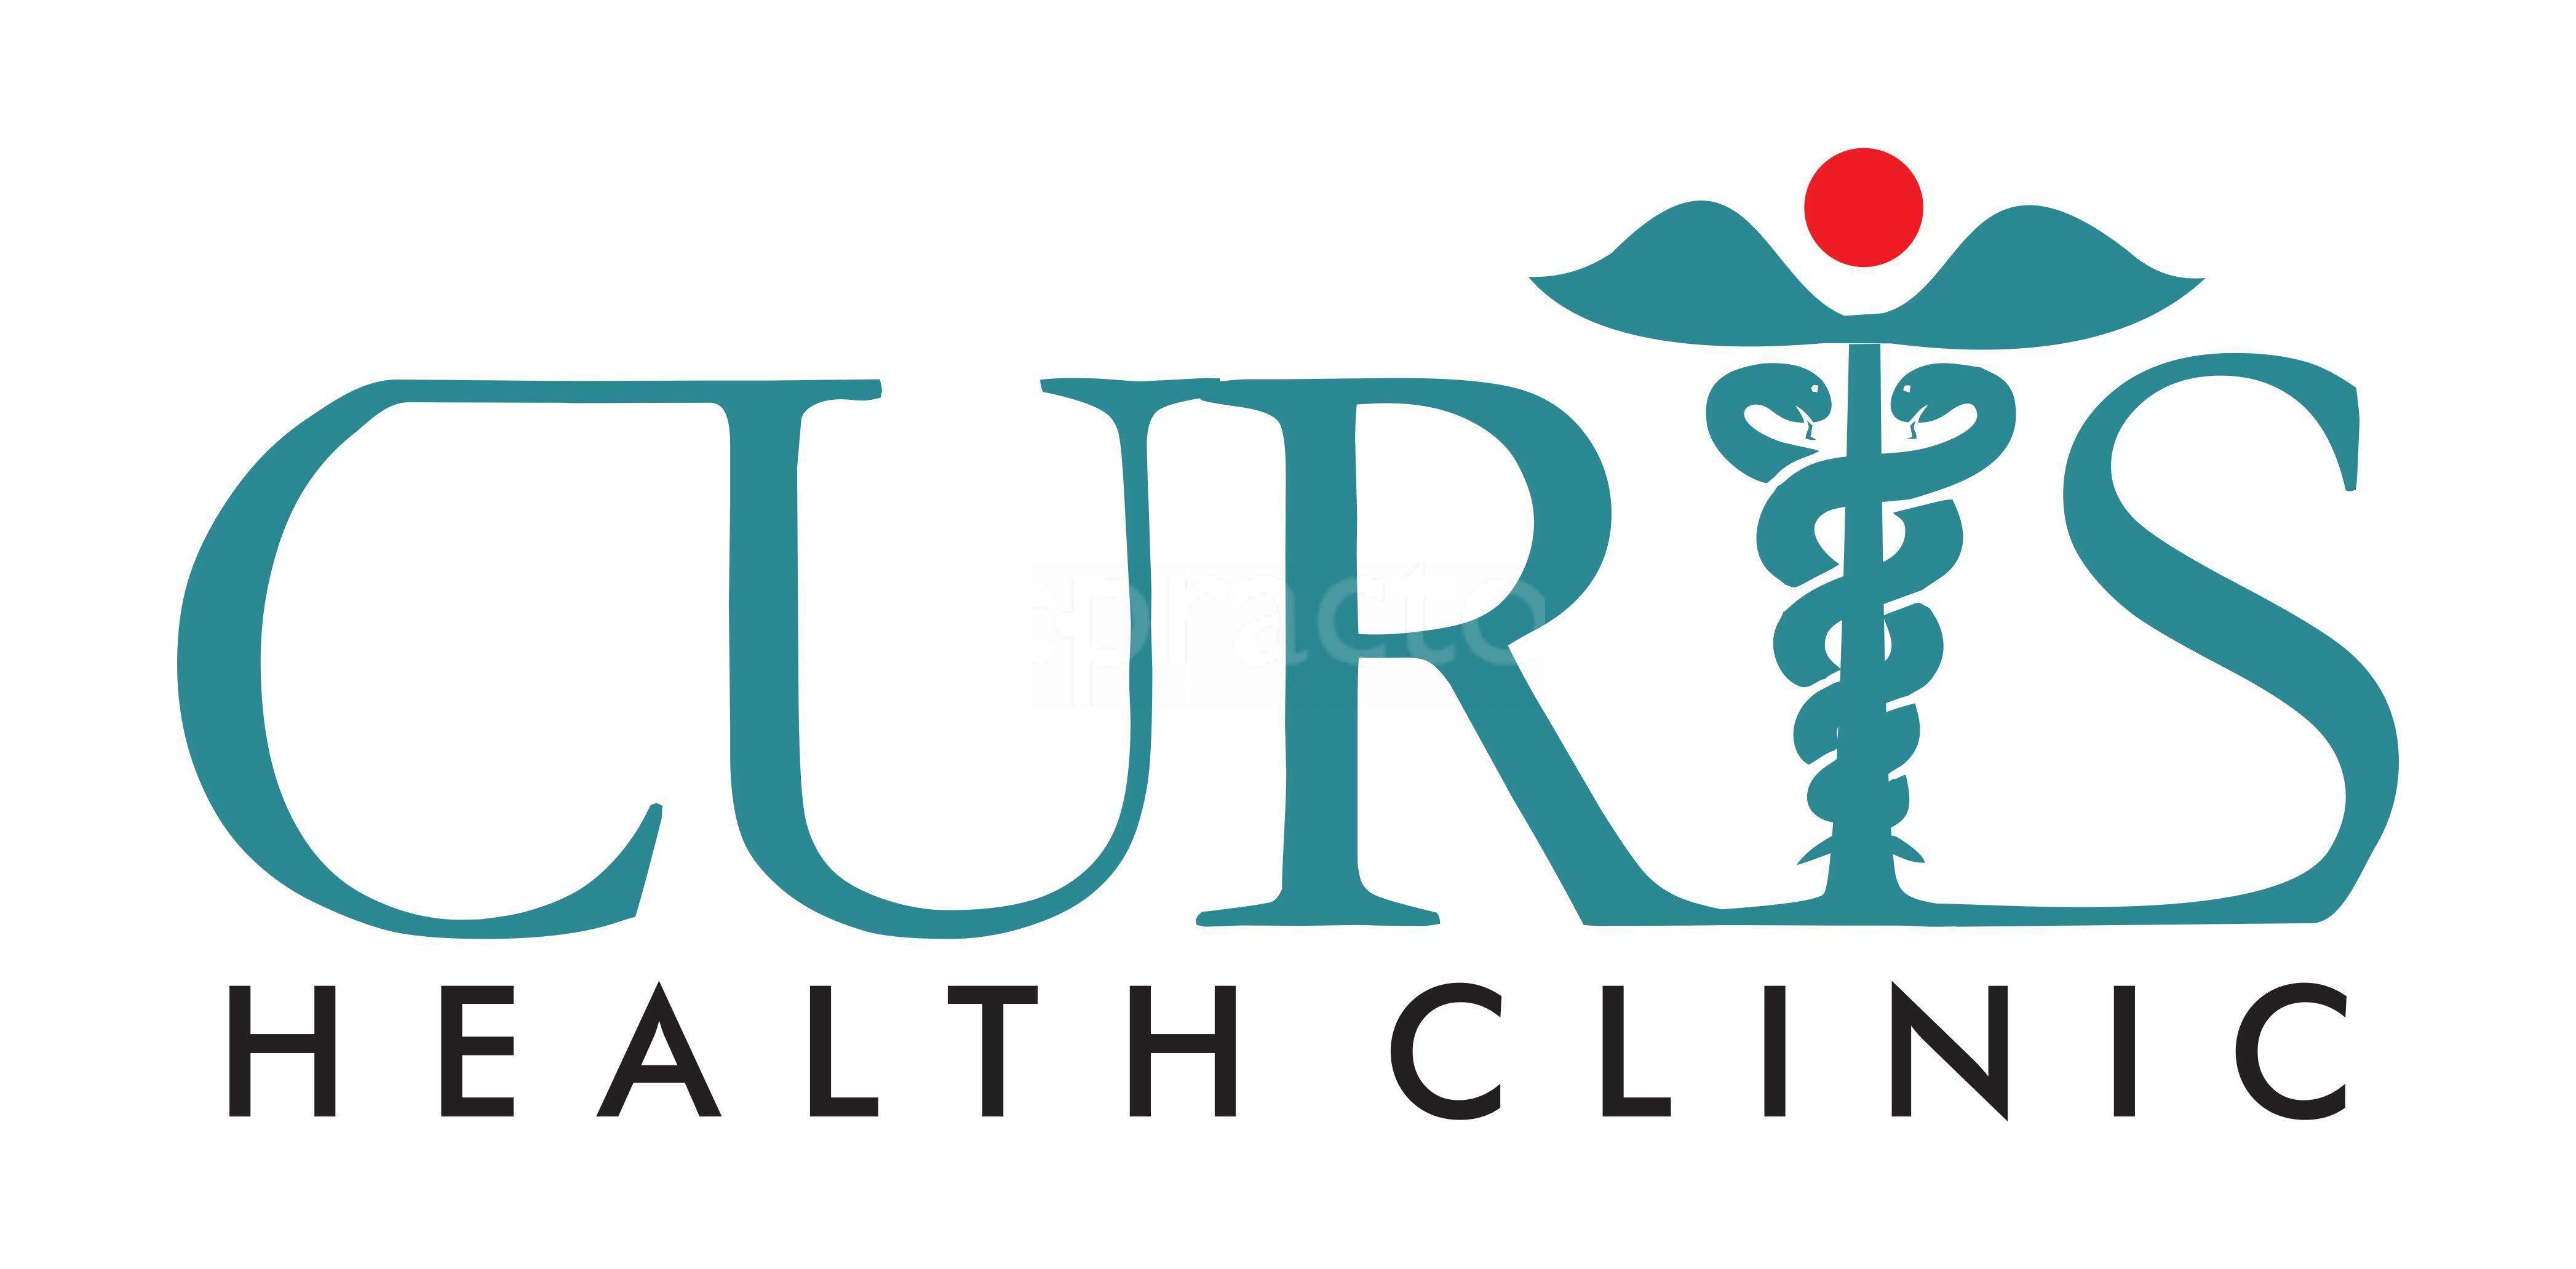 Curis Health Clinic display image